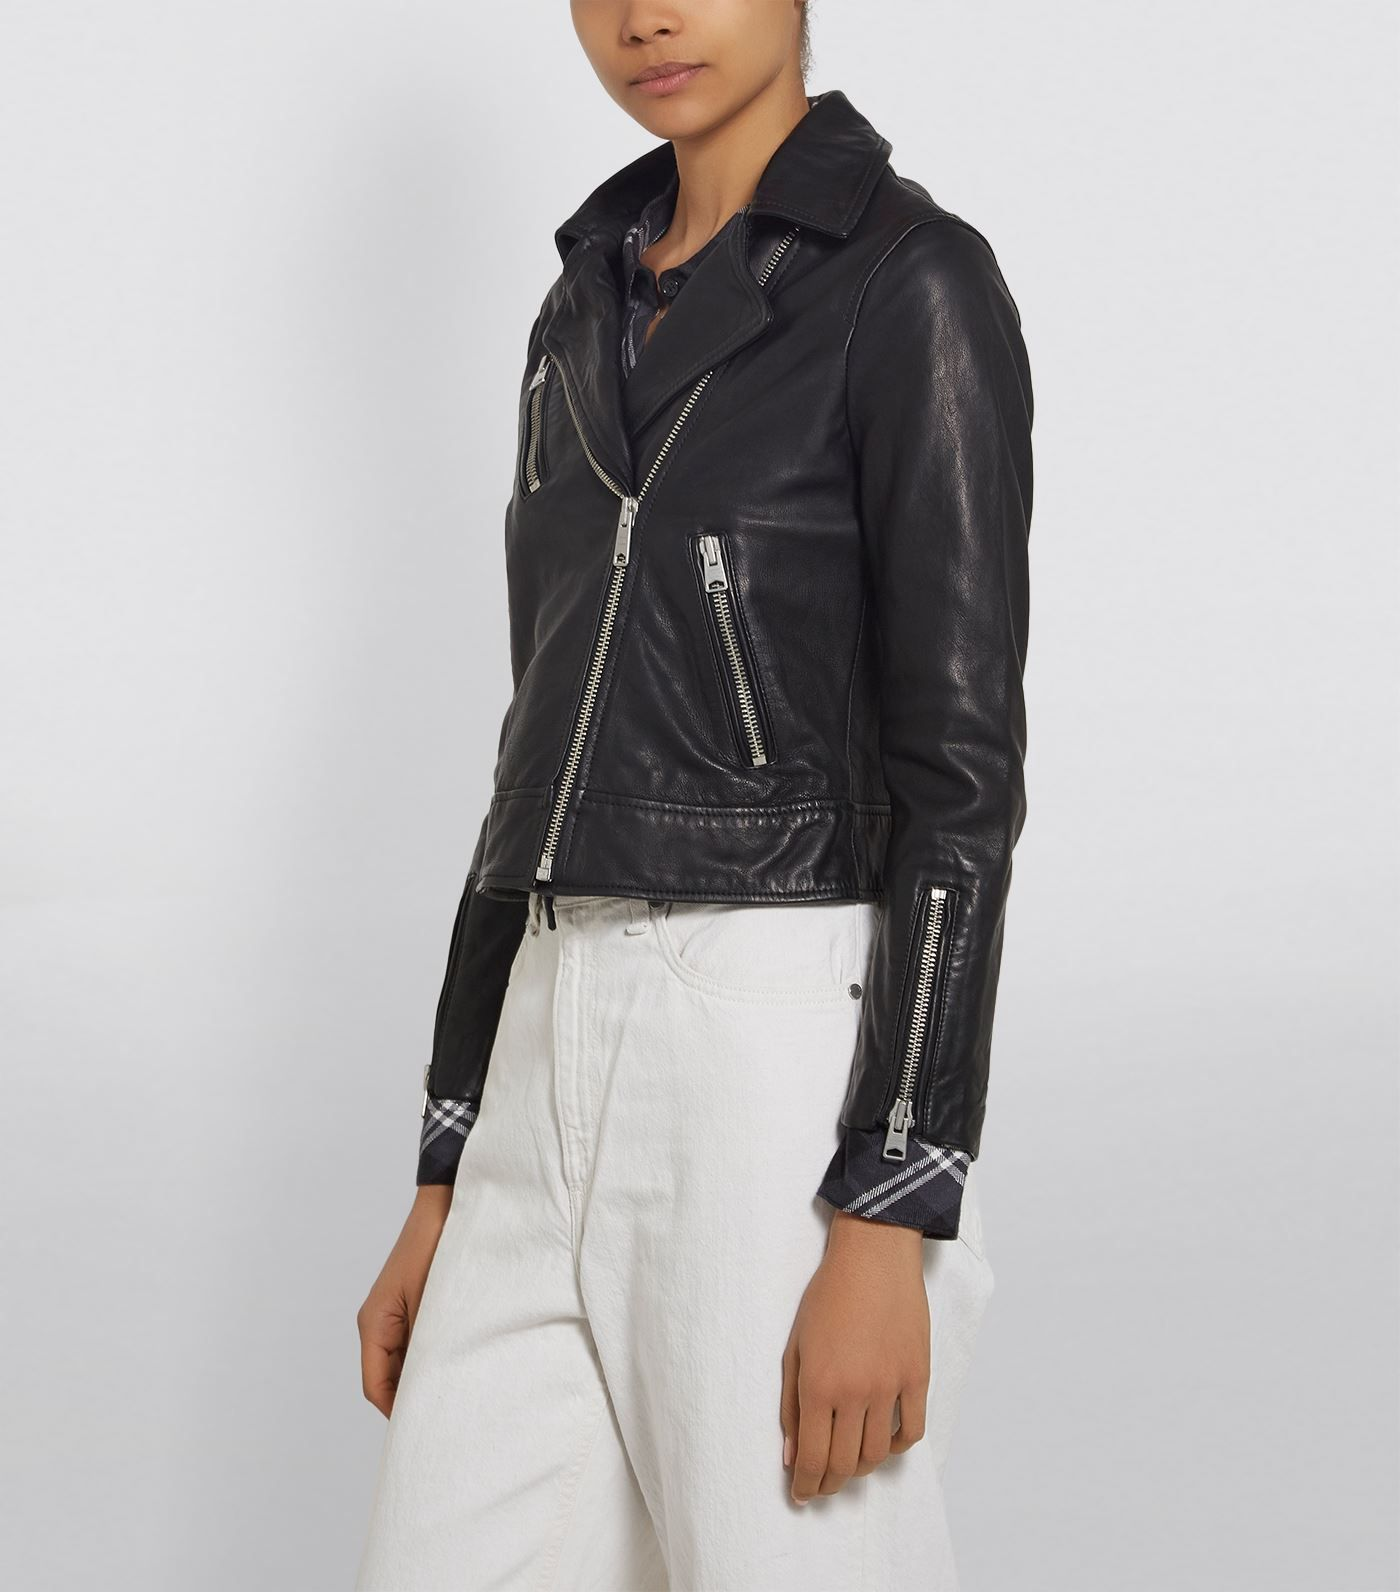 Allsaints Fia Leather Biker Jacket Ad Sponsored Fia Allsaints Leather Jacket Biker Casual Fashion Fashion Leather Biker Jacket [ 1592 x 1400 Pixel ]